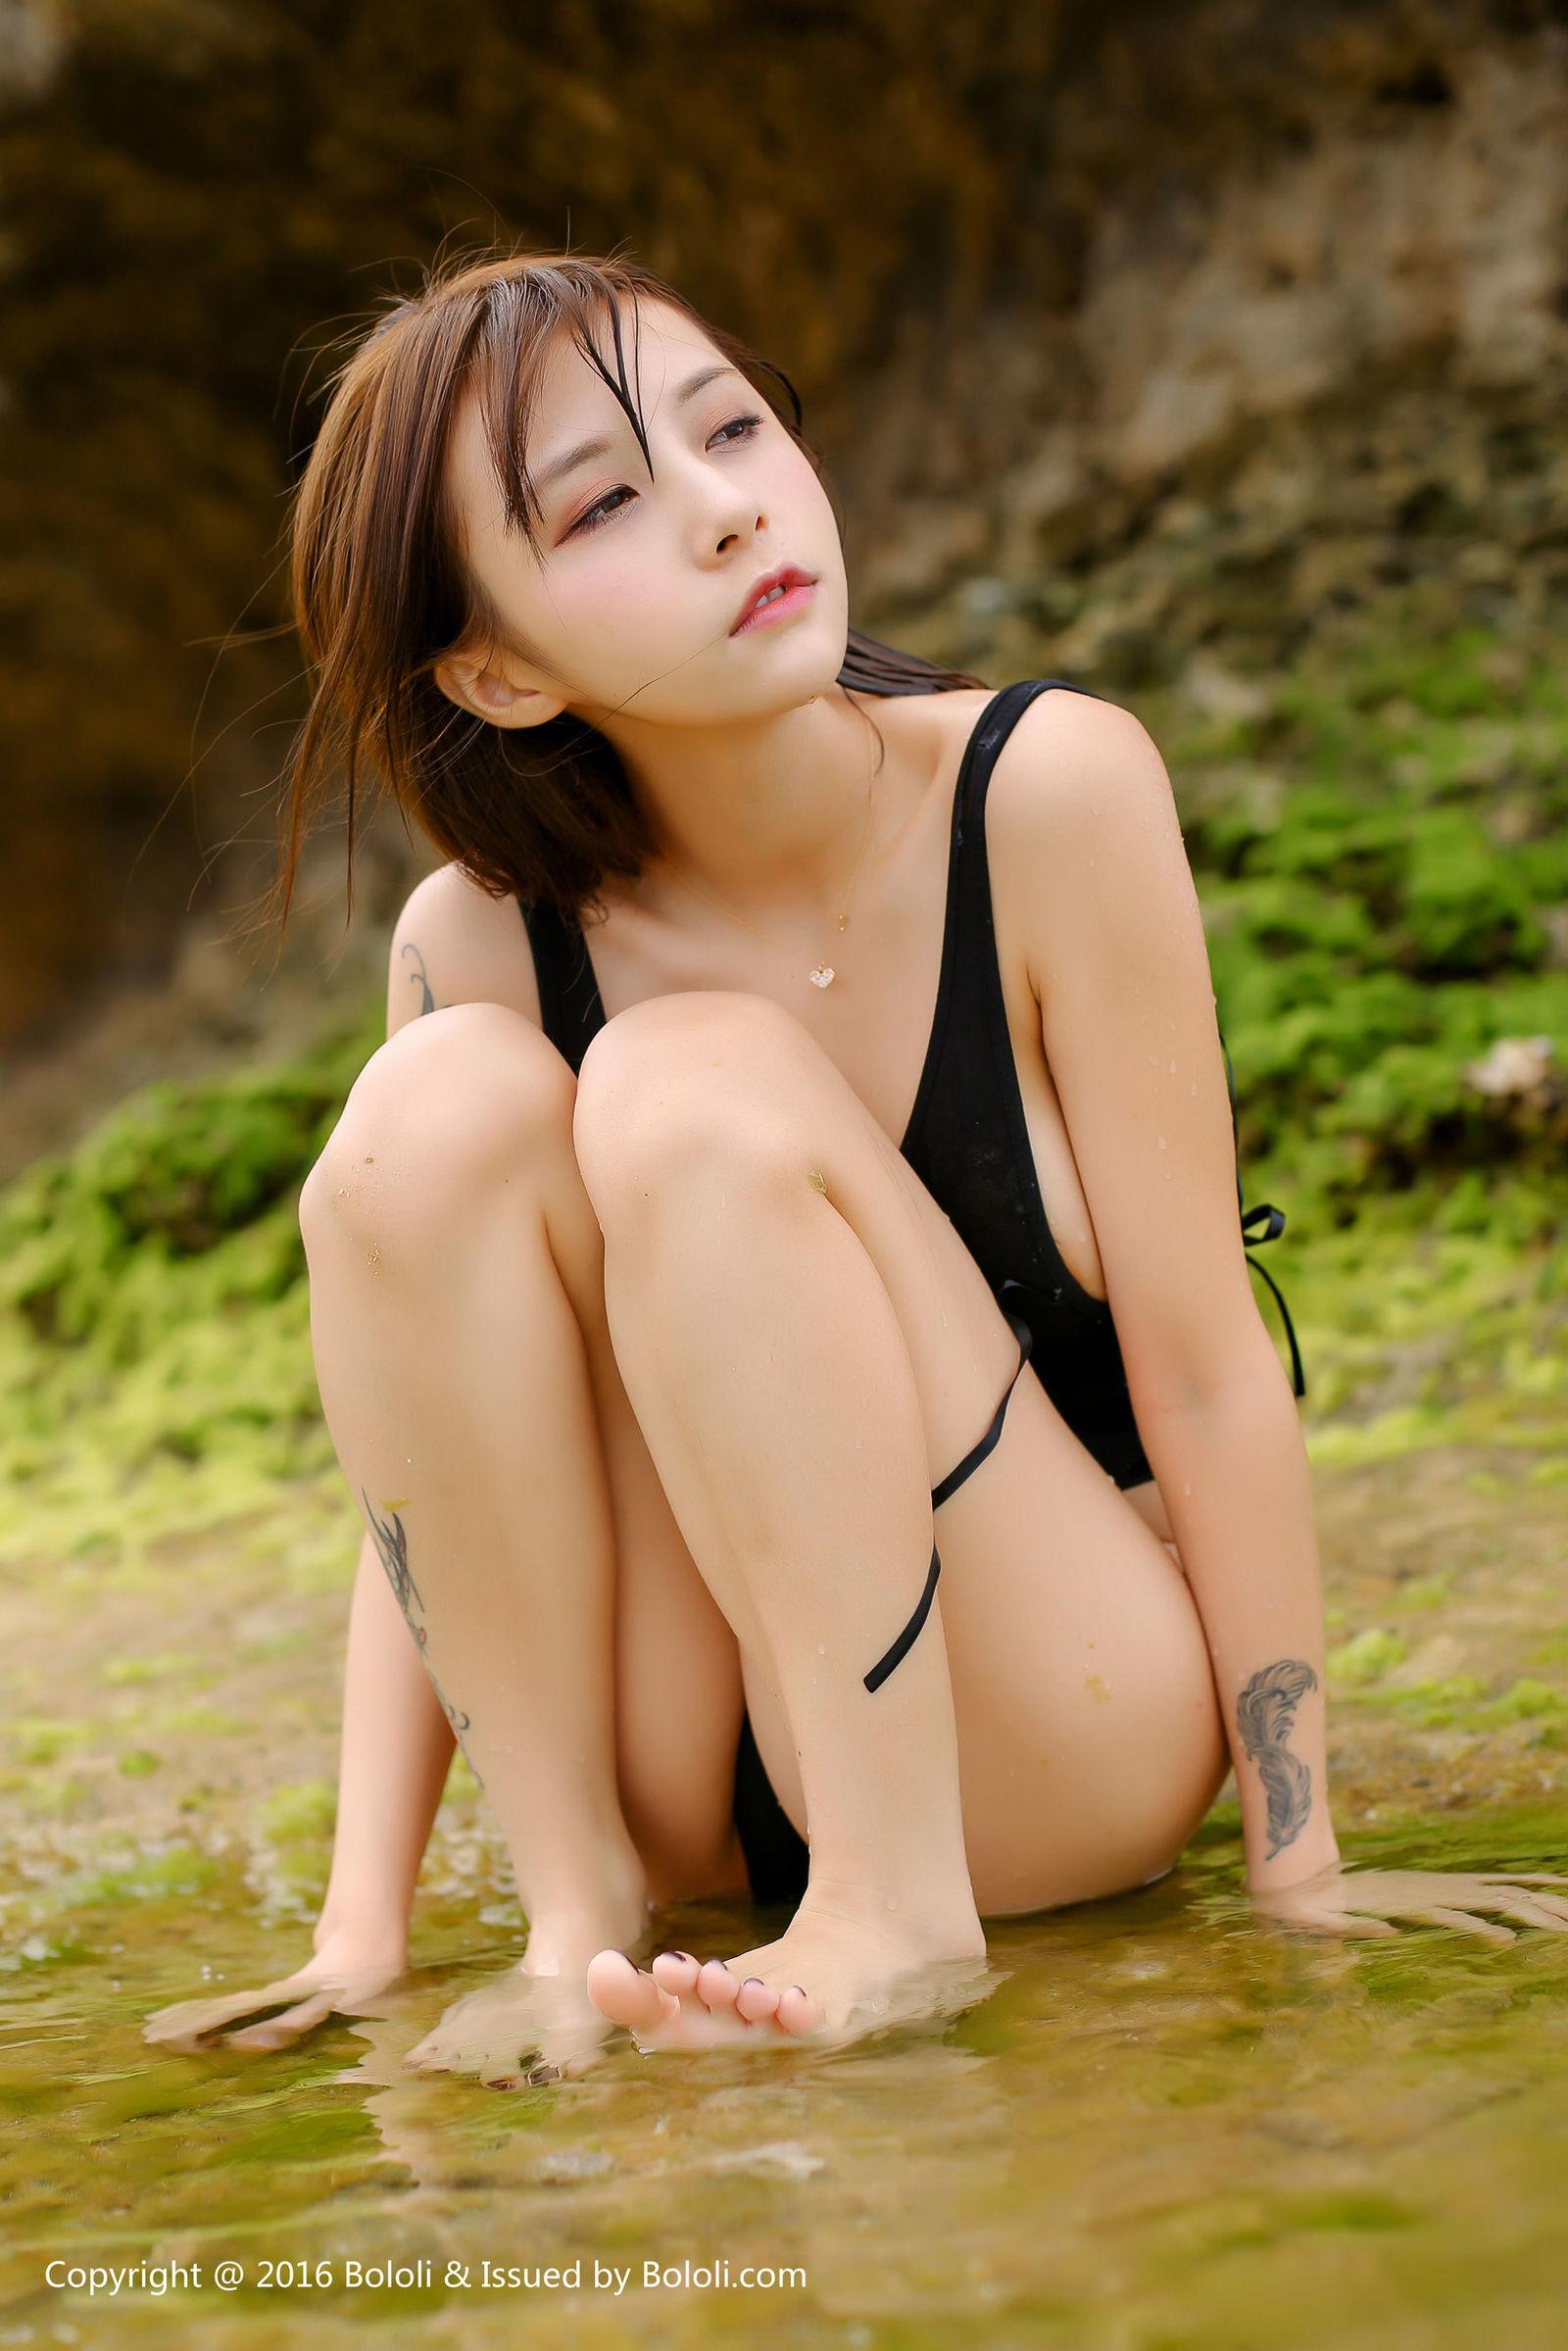 [Bololi波萝社] BOL.068 夏美酱 - 黑色连体衣 丝袜美图[36P]